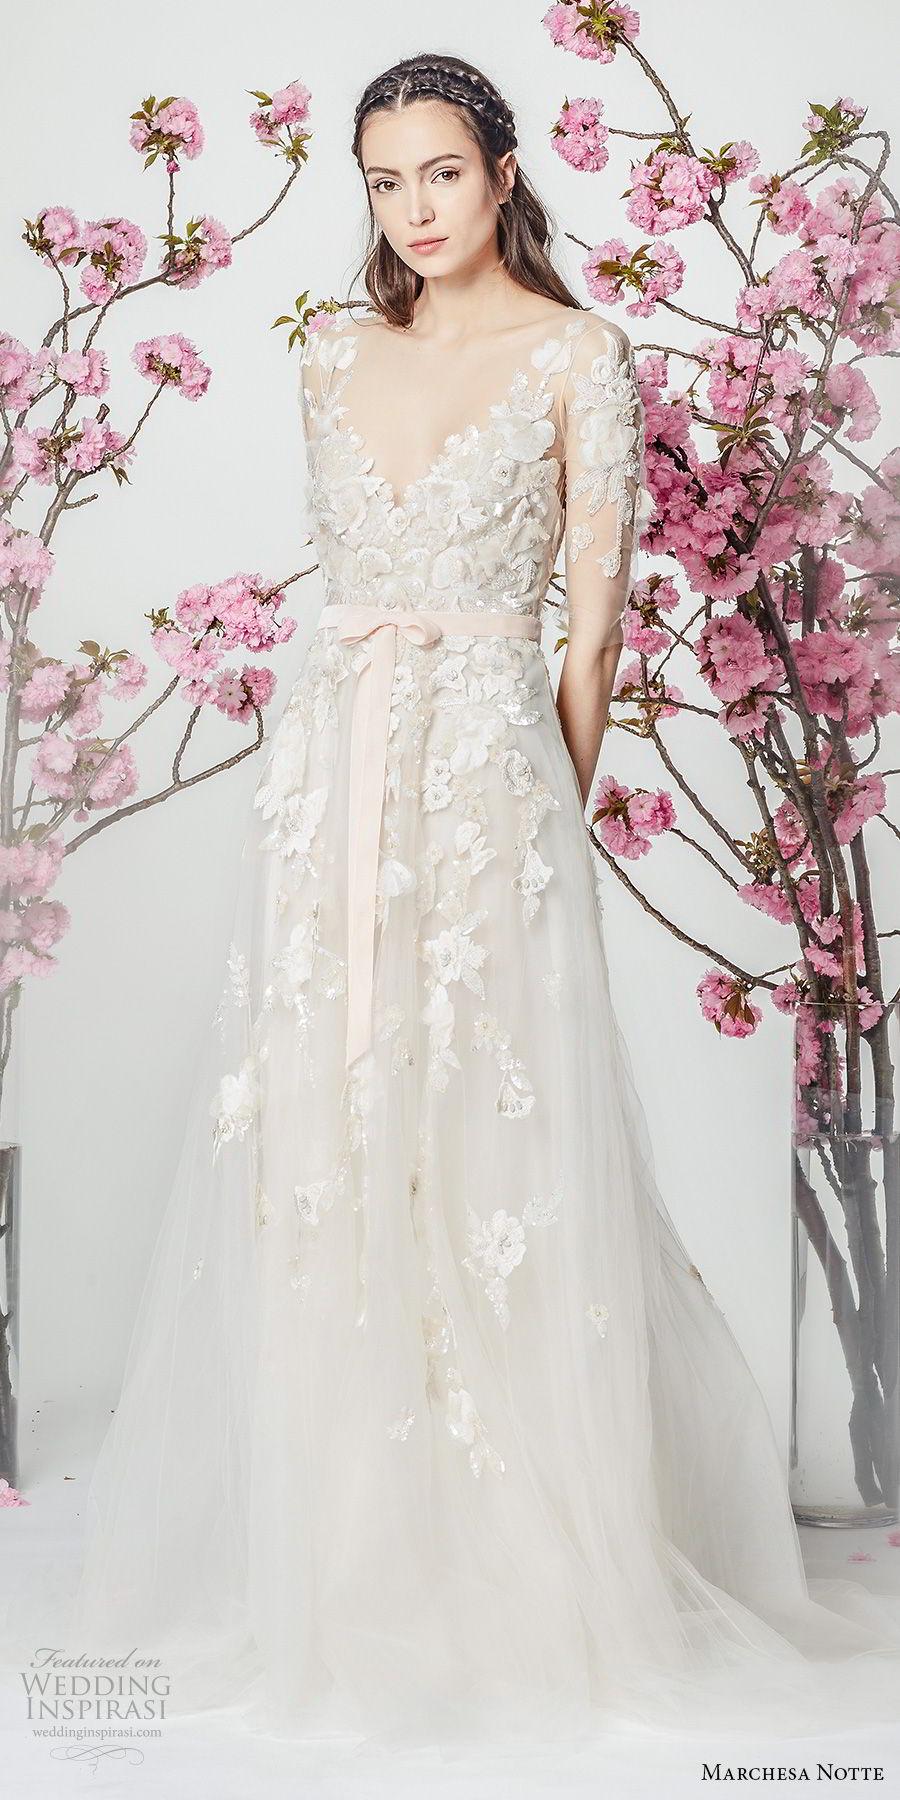 marchesa notte spring 2018 bridal half sleeves v neck heavily embellished bodice tulle skirt romantic modified a  line wedding dress short train (1) mv